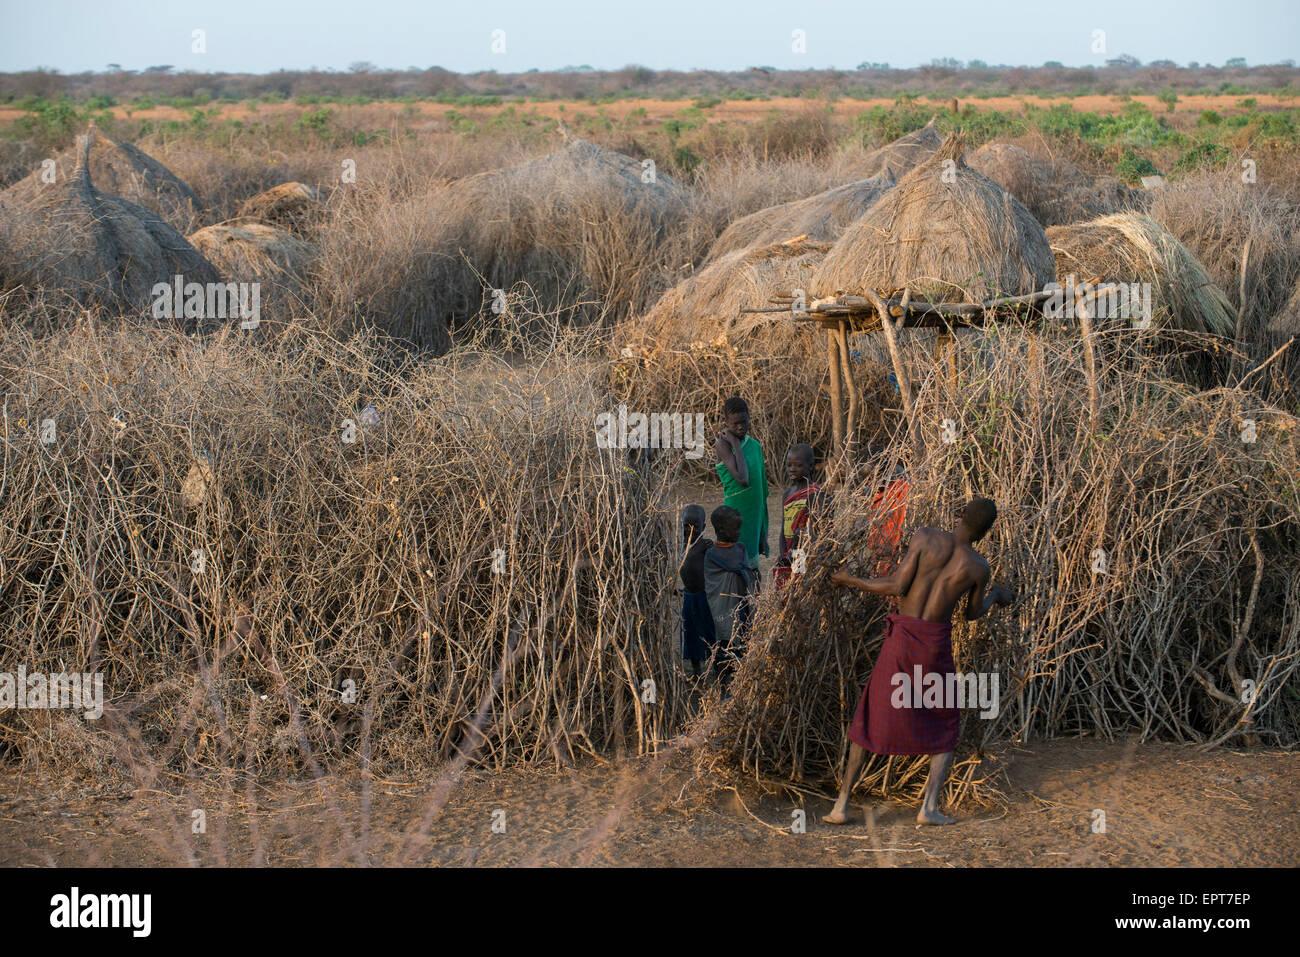 ETHIOPIA, Southern Nations, Lower Omo valley, Kangaten, village Kakuta of Nyangatom tribe, thorn shrub fenced Kral - Stock Image